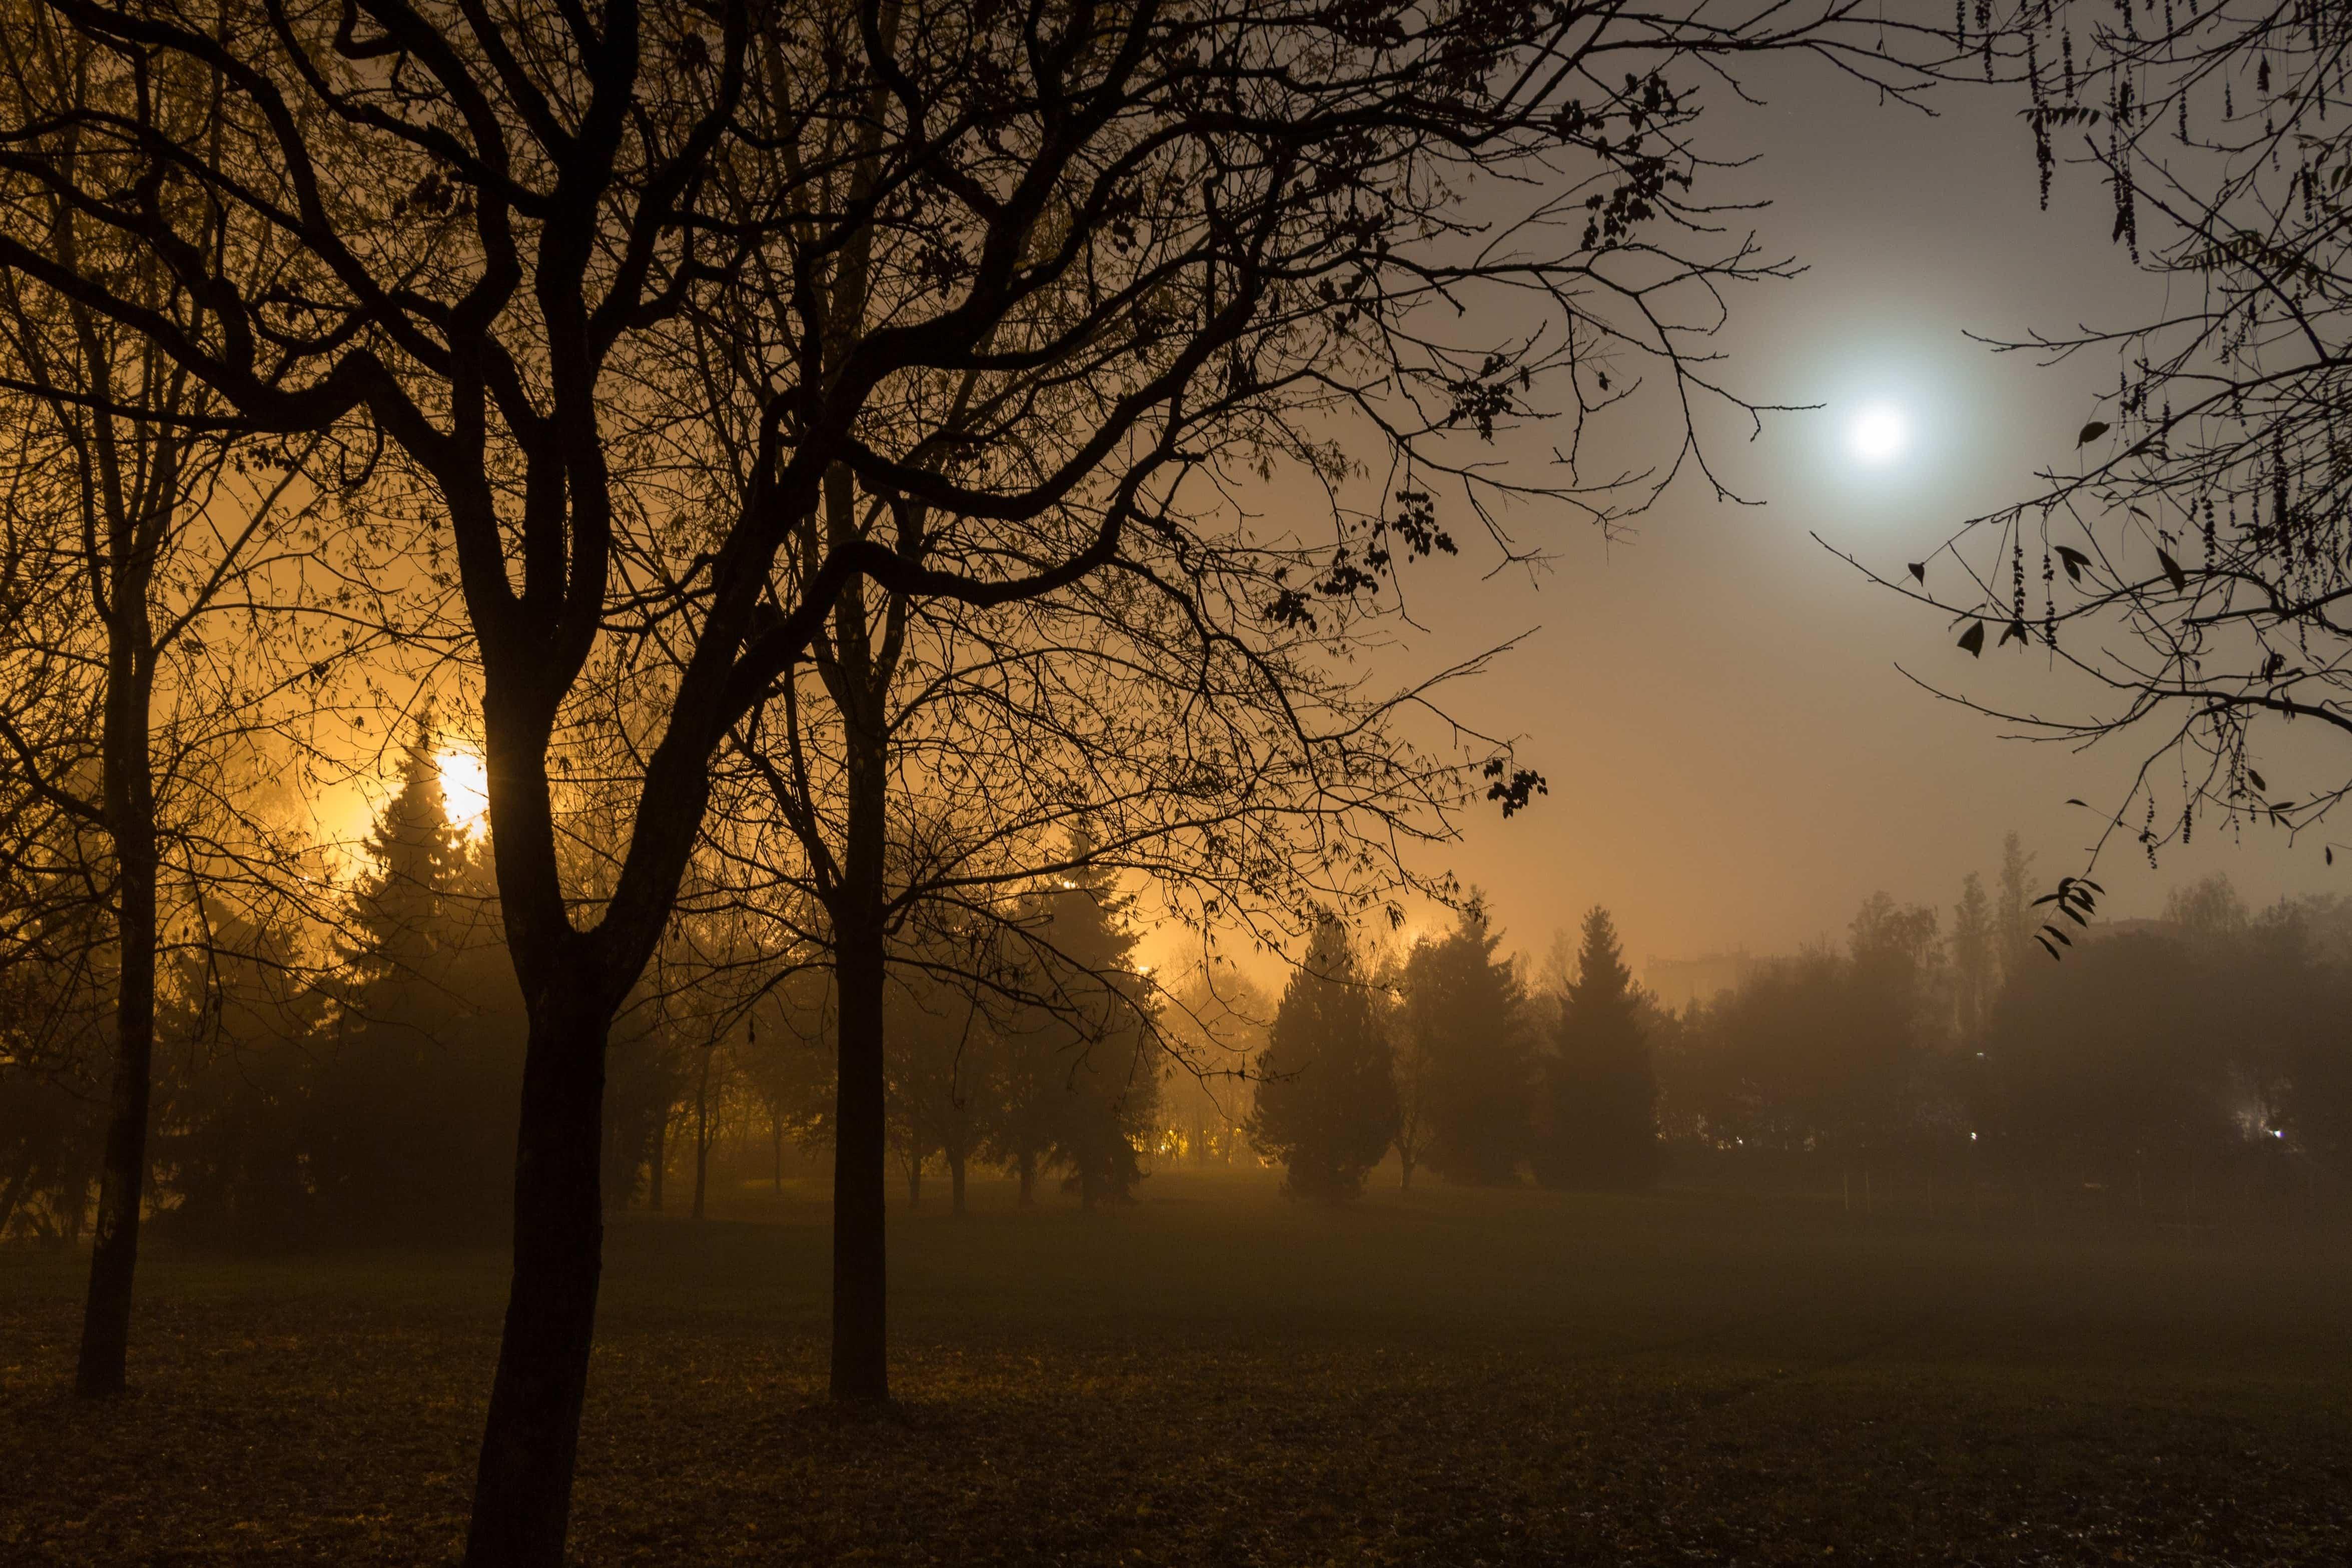 Fall Mountain Lake Wallpaper Free Picture Silhouette Tree Dawn Sun Landscape Fog